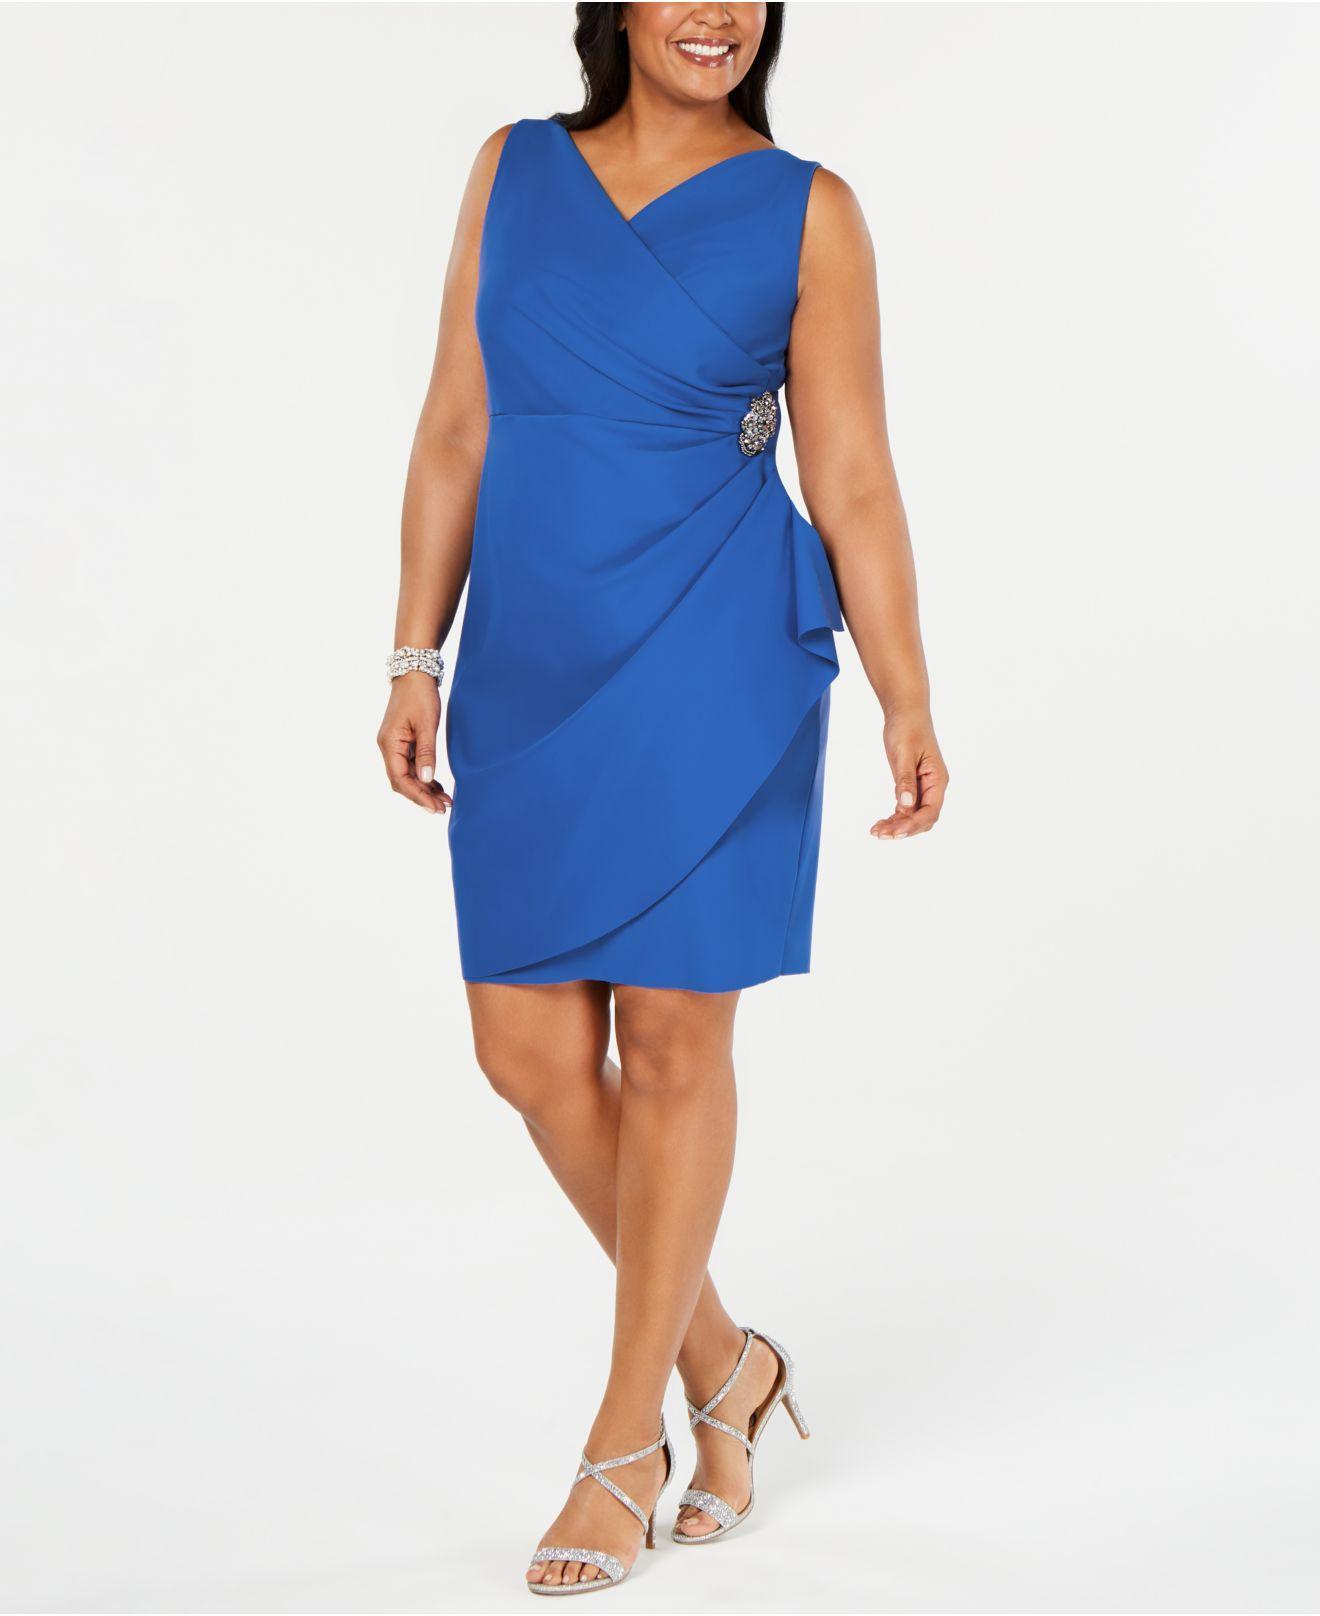 63aaa04c9b84 Lyst - Alex Evenings Plus Size Side-ruched Surplice Sheath Dress in Blue